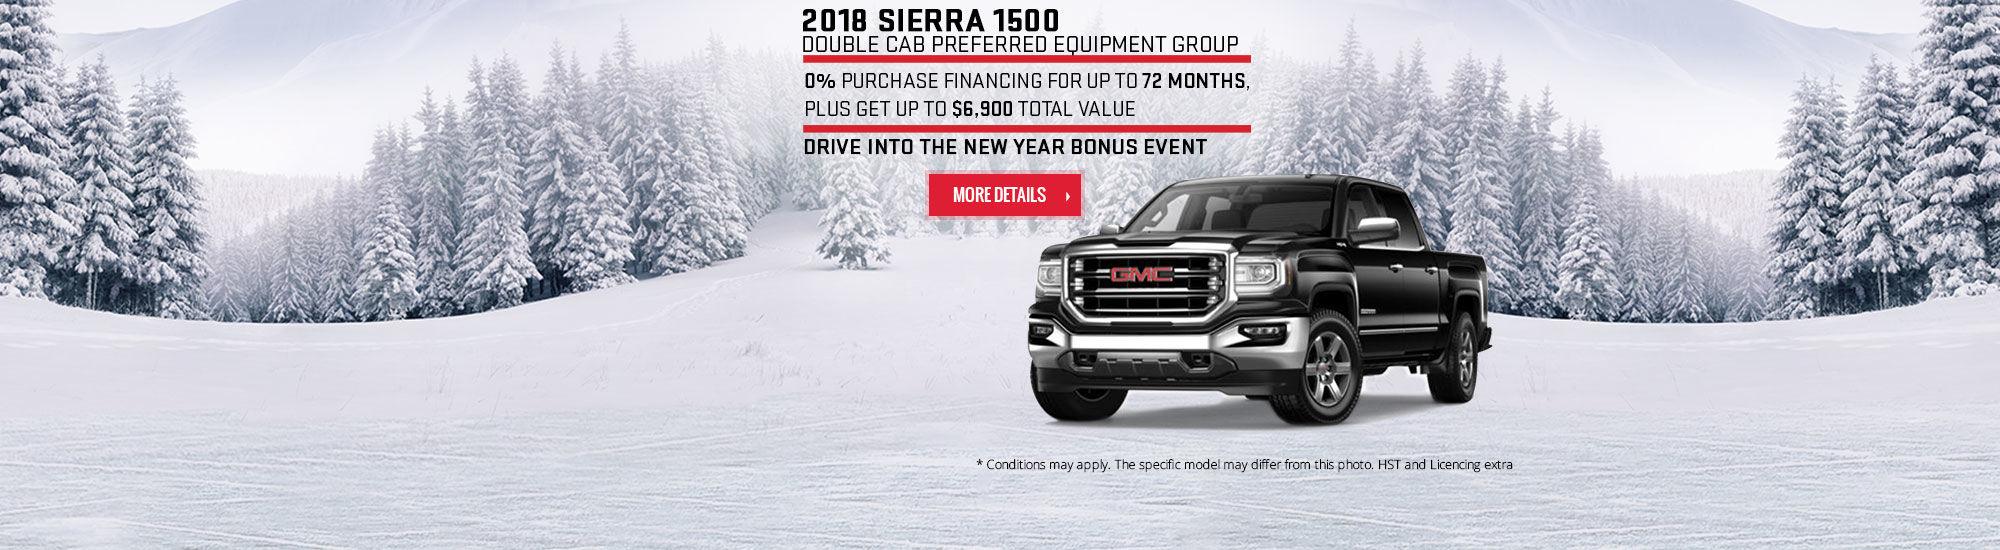 Drive Into the New Year Bonus Event - GMC - Sierra